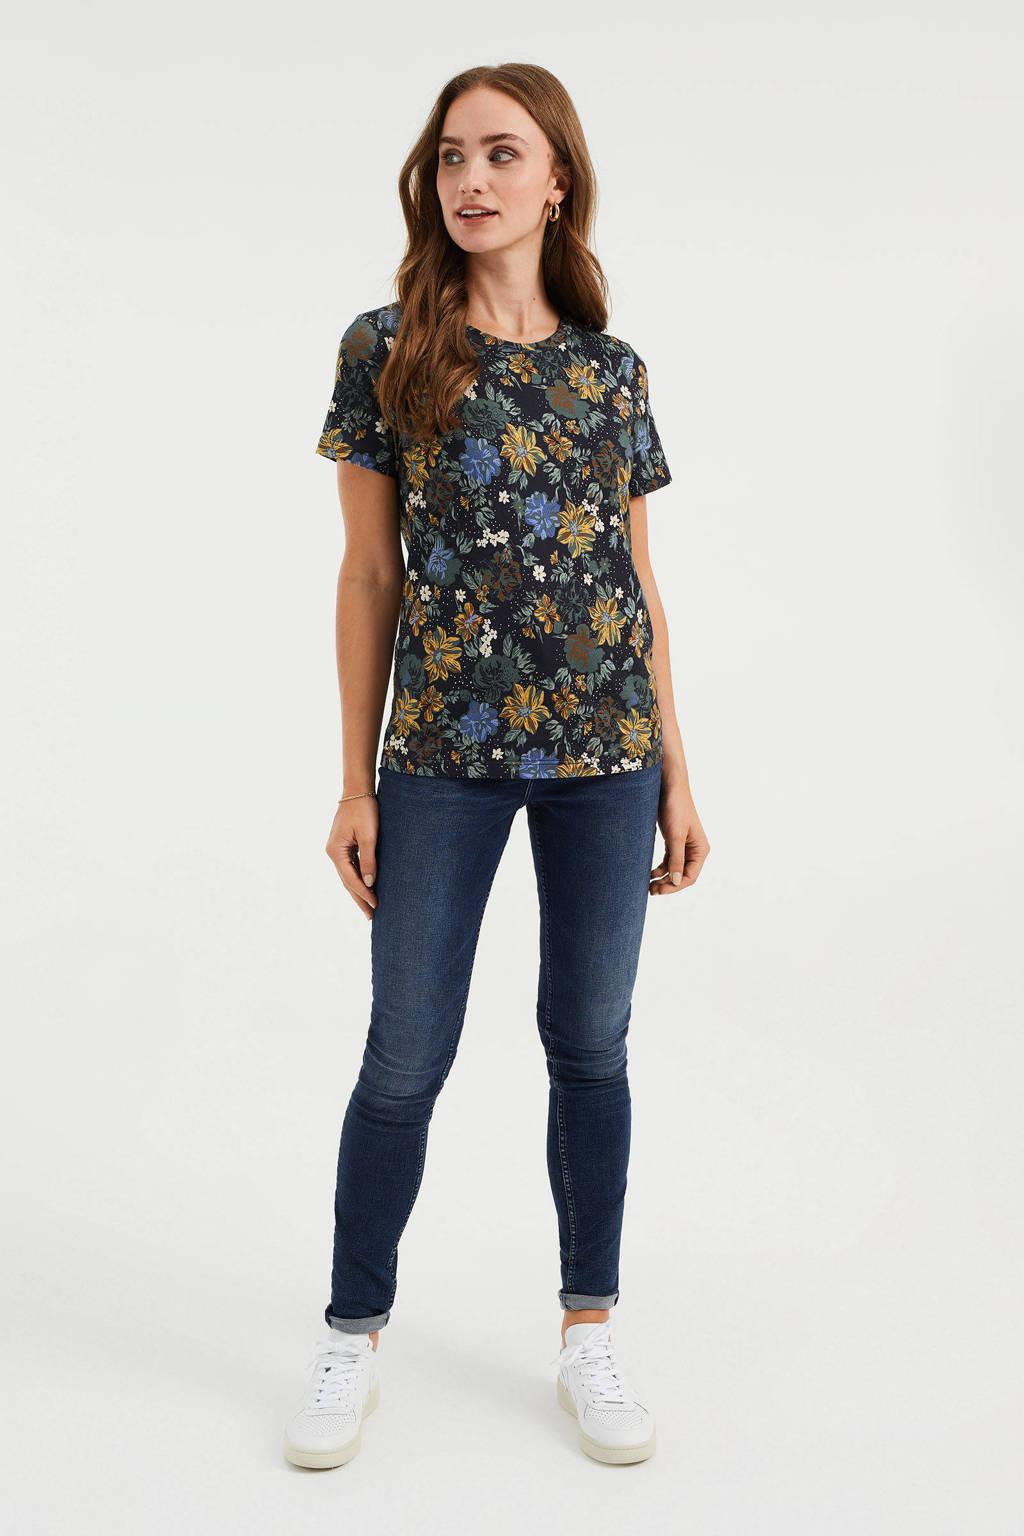 WE Fashion gebloemd T-shirt zwart/groen/blauw/geel, Zwart/groen/blauw/geel